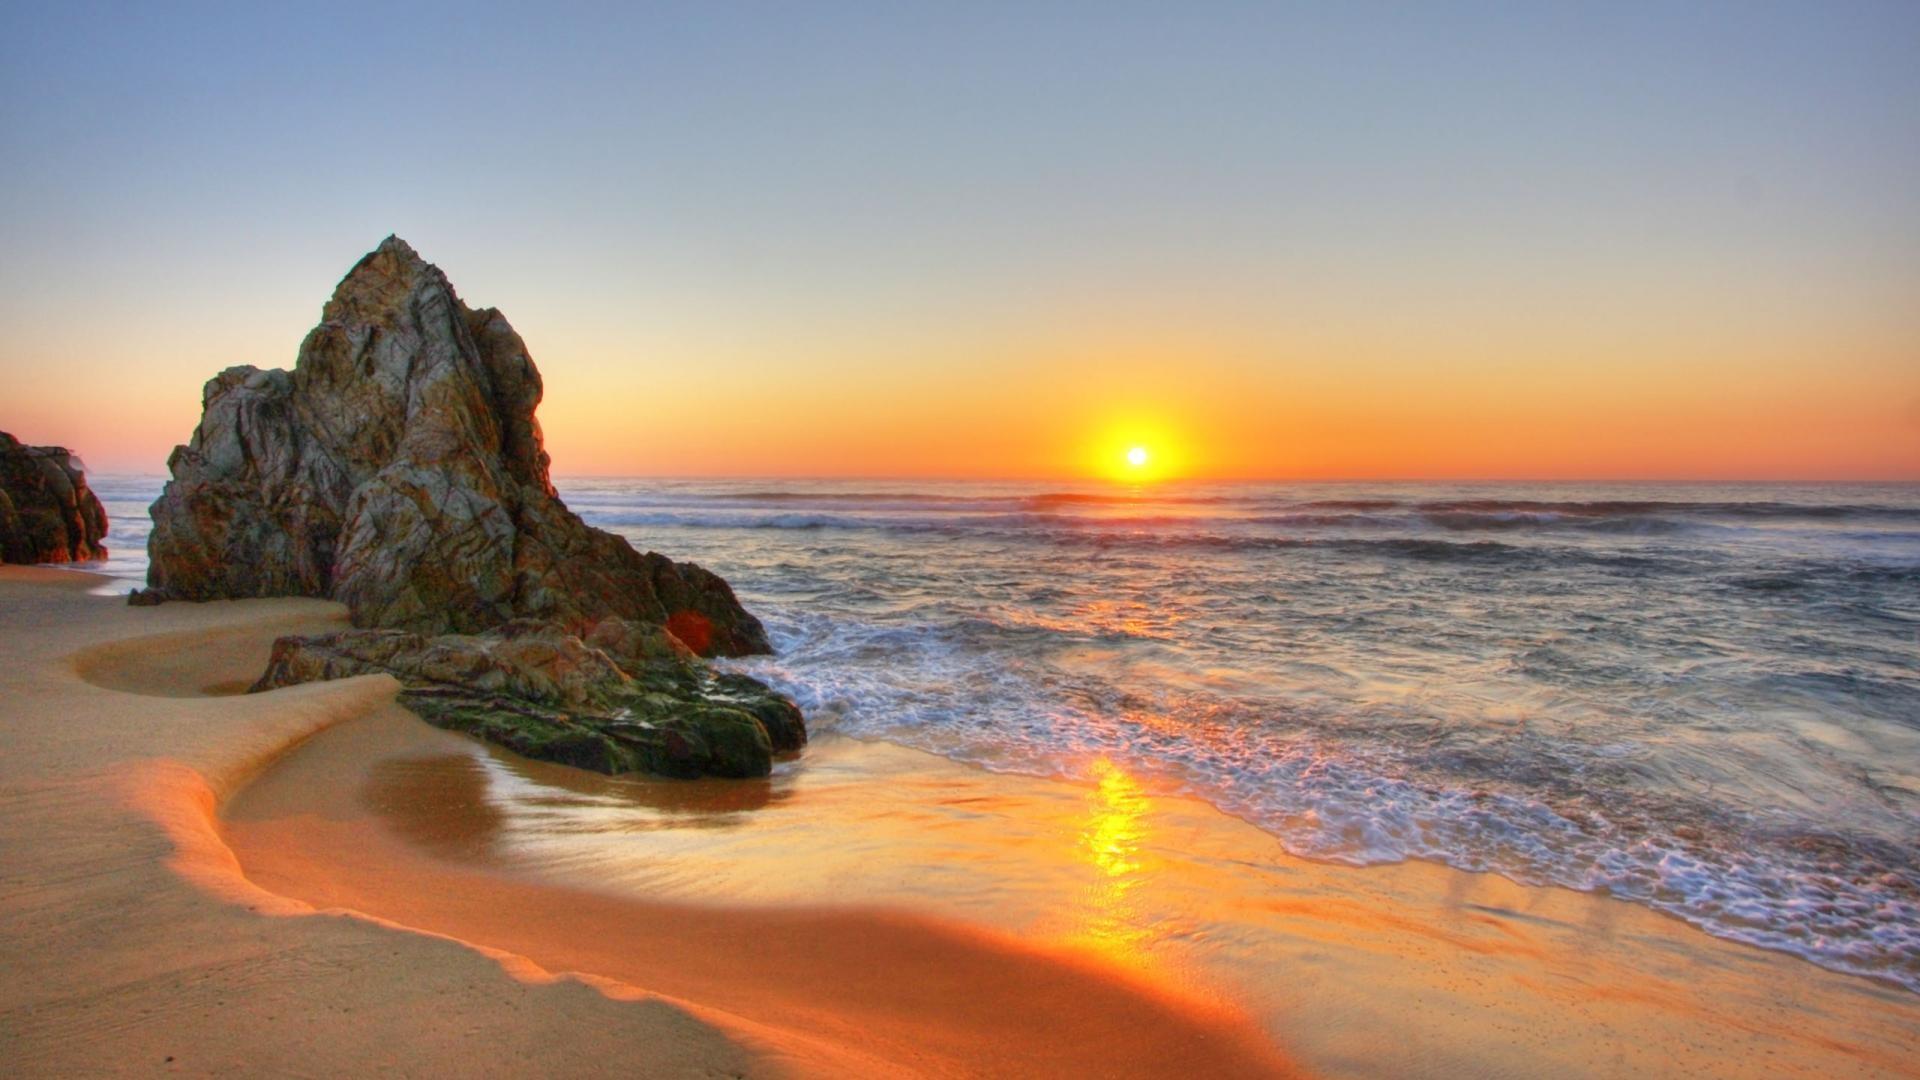 Beach Sunset Background